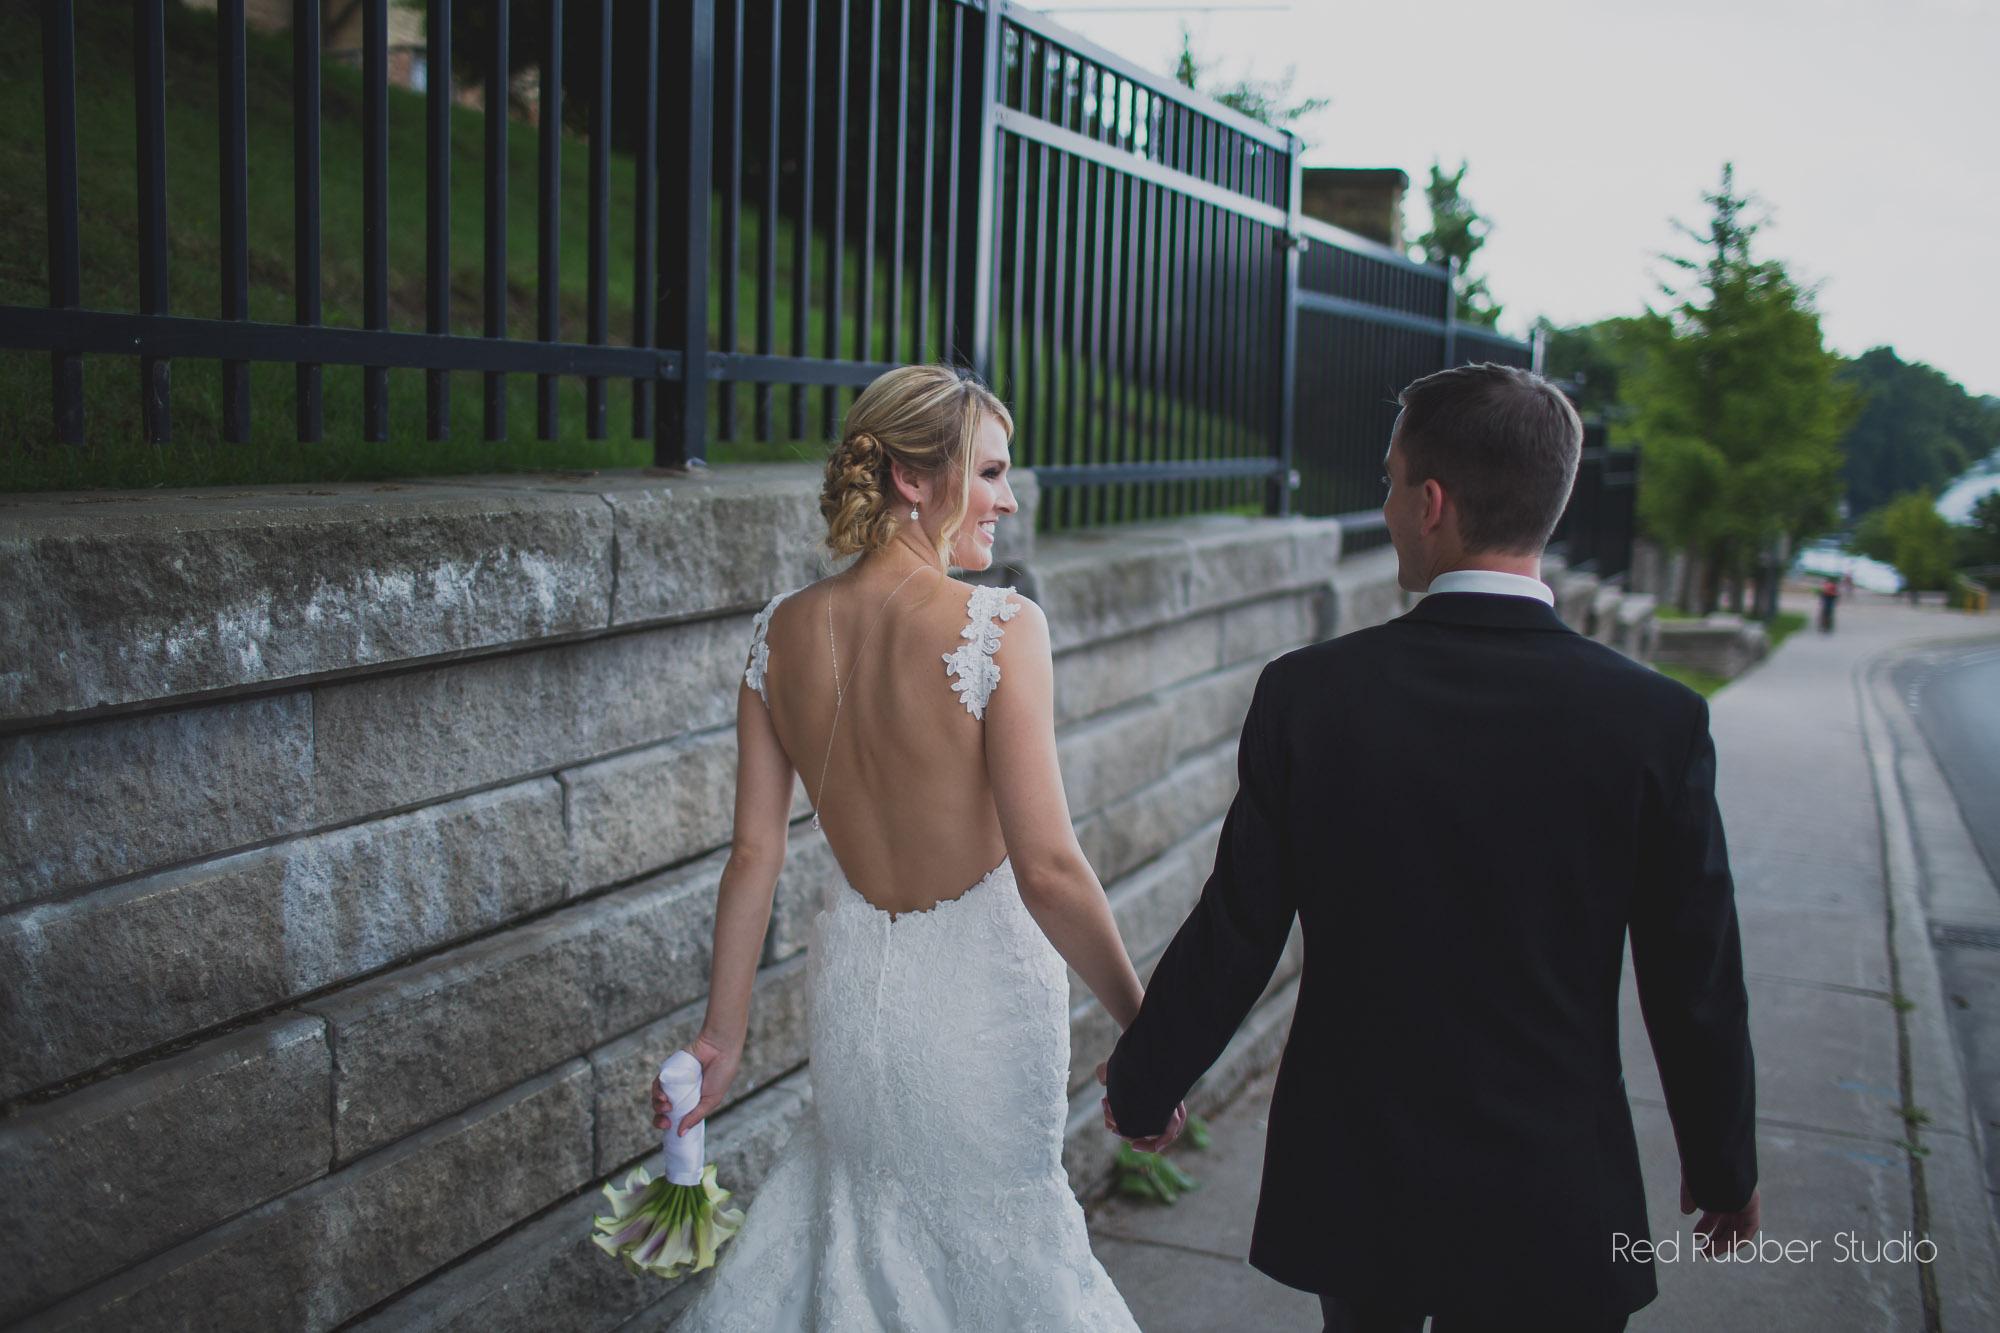 Wedding Jewelry - Delicate Bridal Necklace